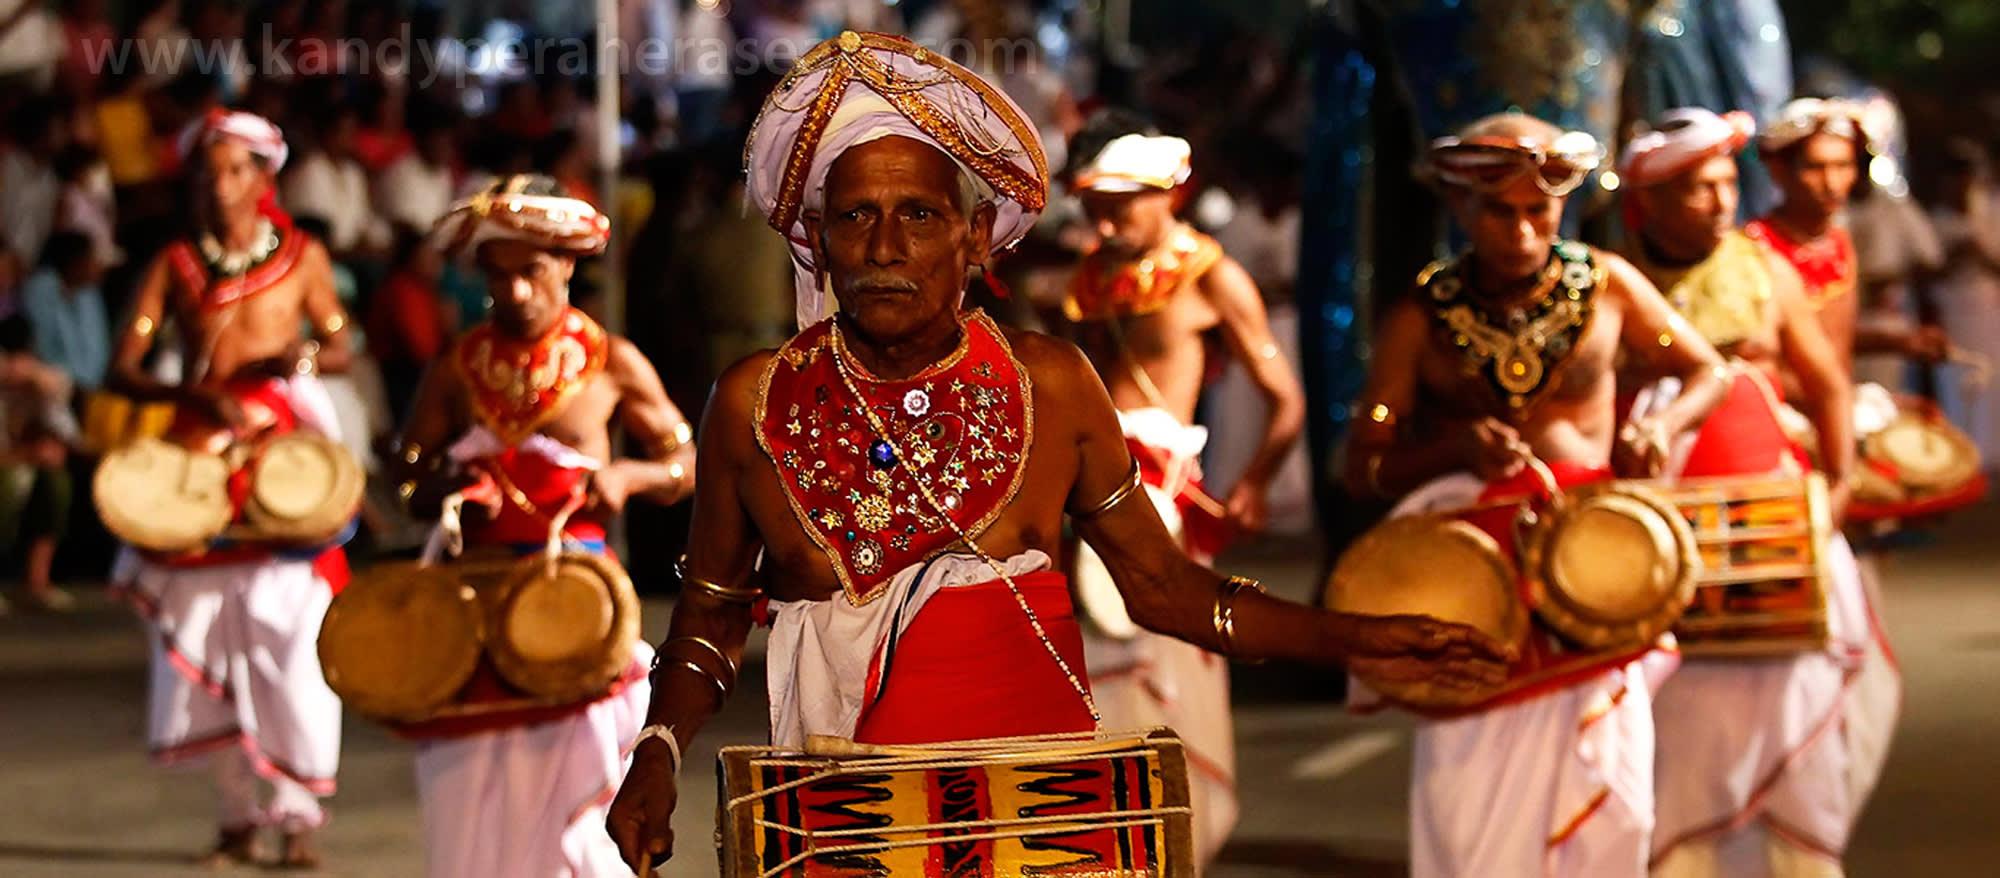 Kandy Perahera Festival  in Sri Lanka